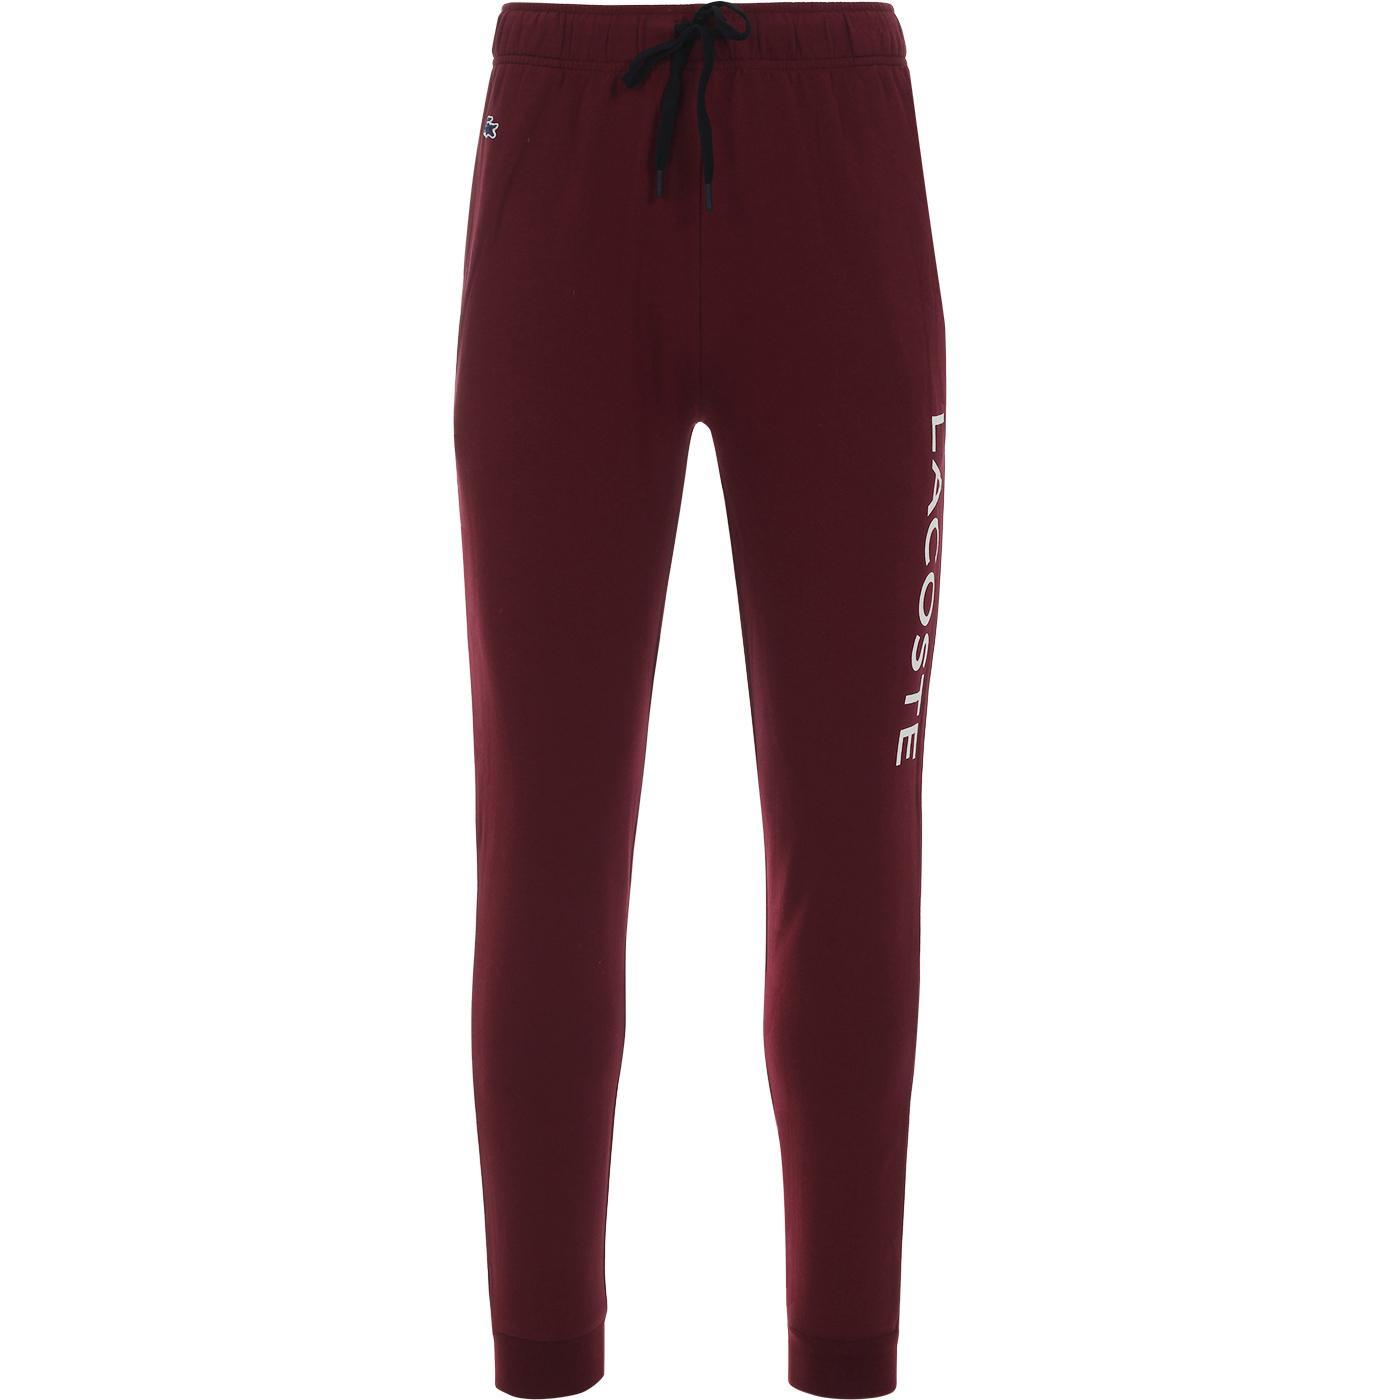 LACOSTE Retro Loungewear Logo Pants DR